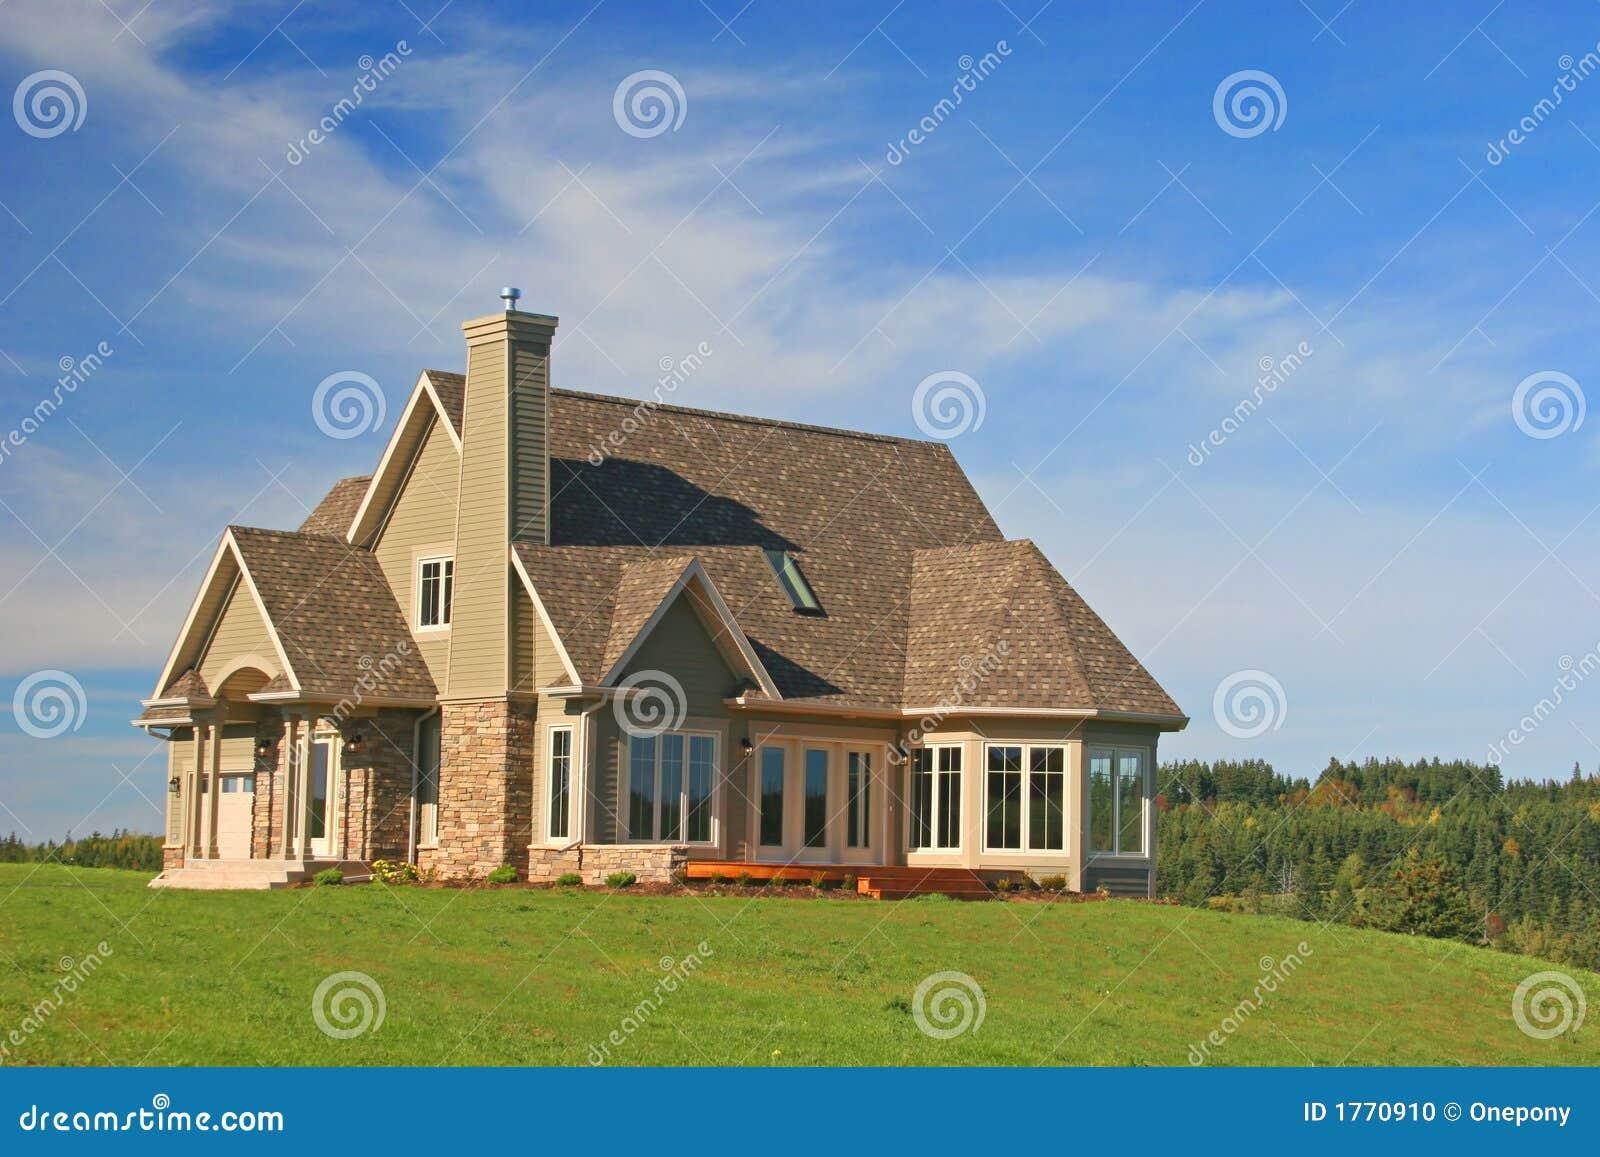 Stock Photo Brand New House Image1770910 on Hillside House Plans